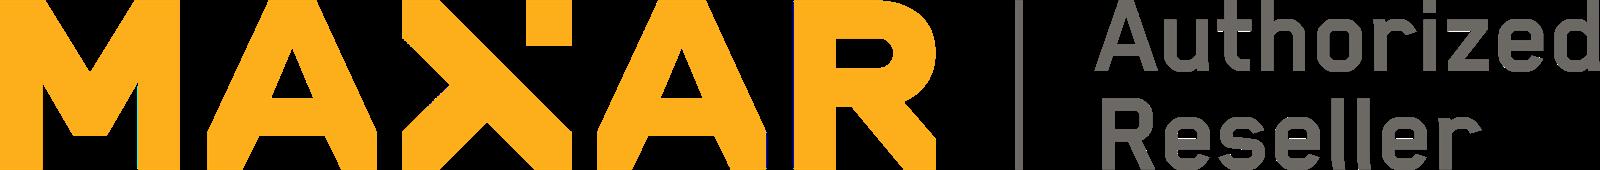 Maxar Authorized Reseller Logo- Grey